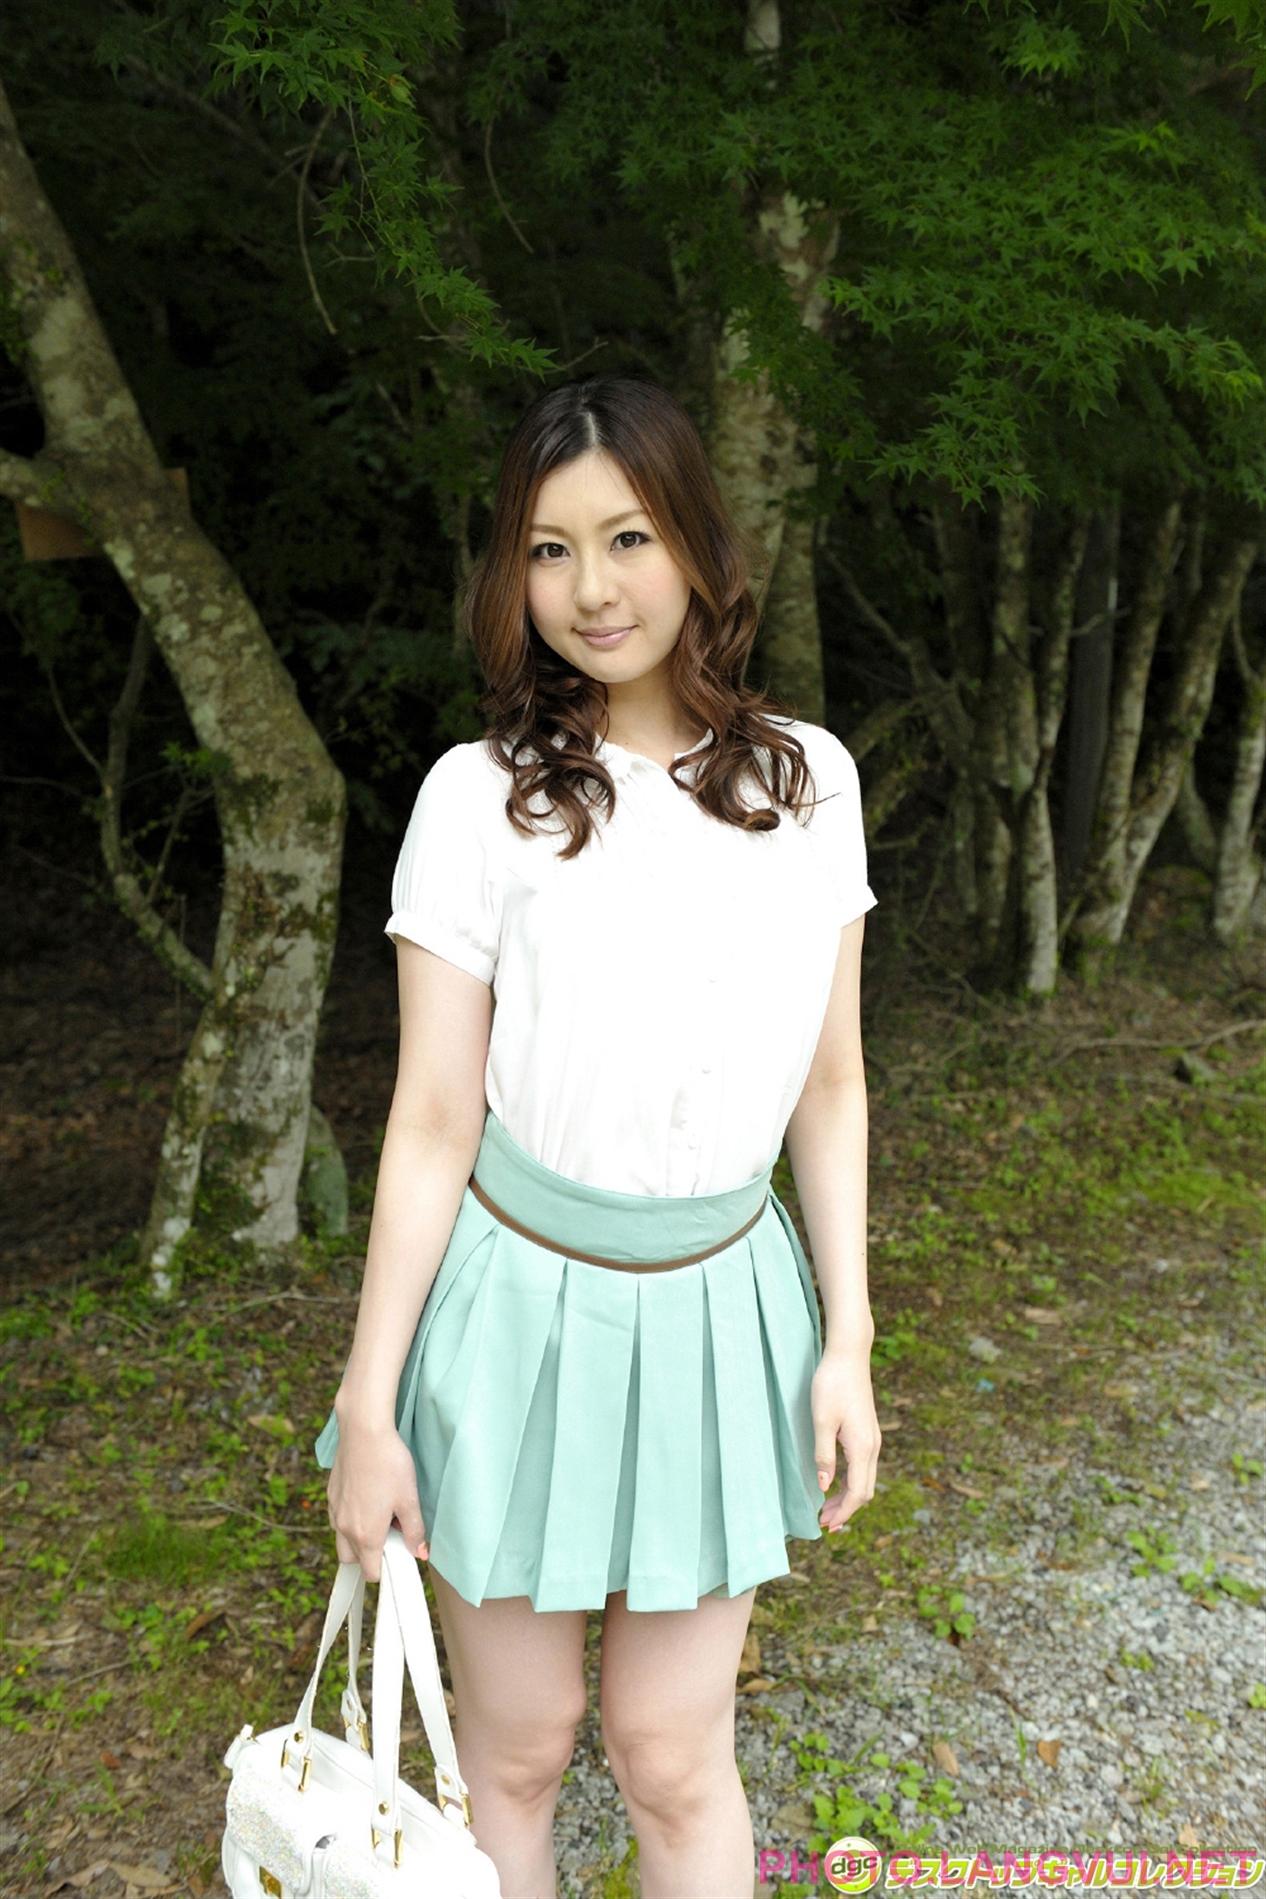 DGC No 1213 Yui Tatsumi - Page 3 of 11 - Ảnh Girl Xinh